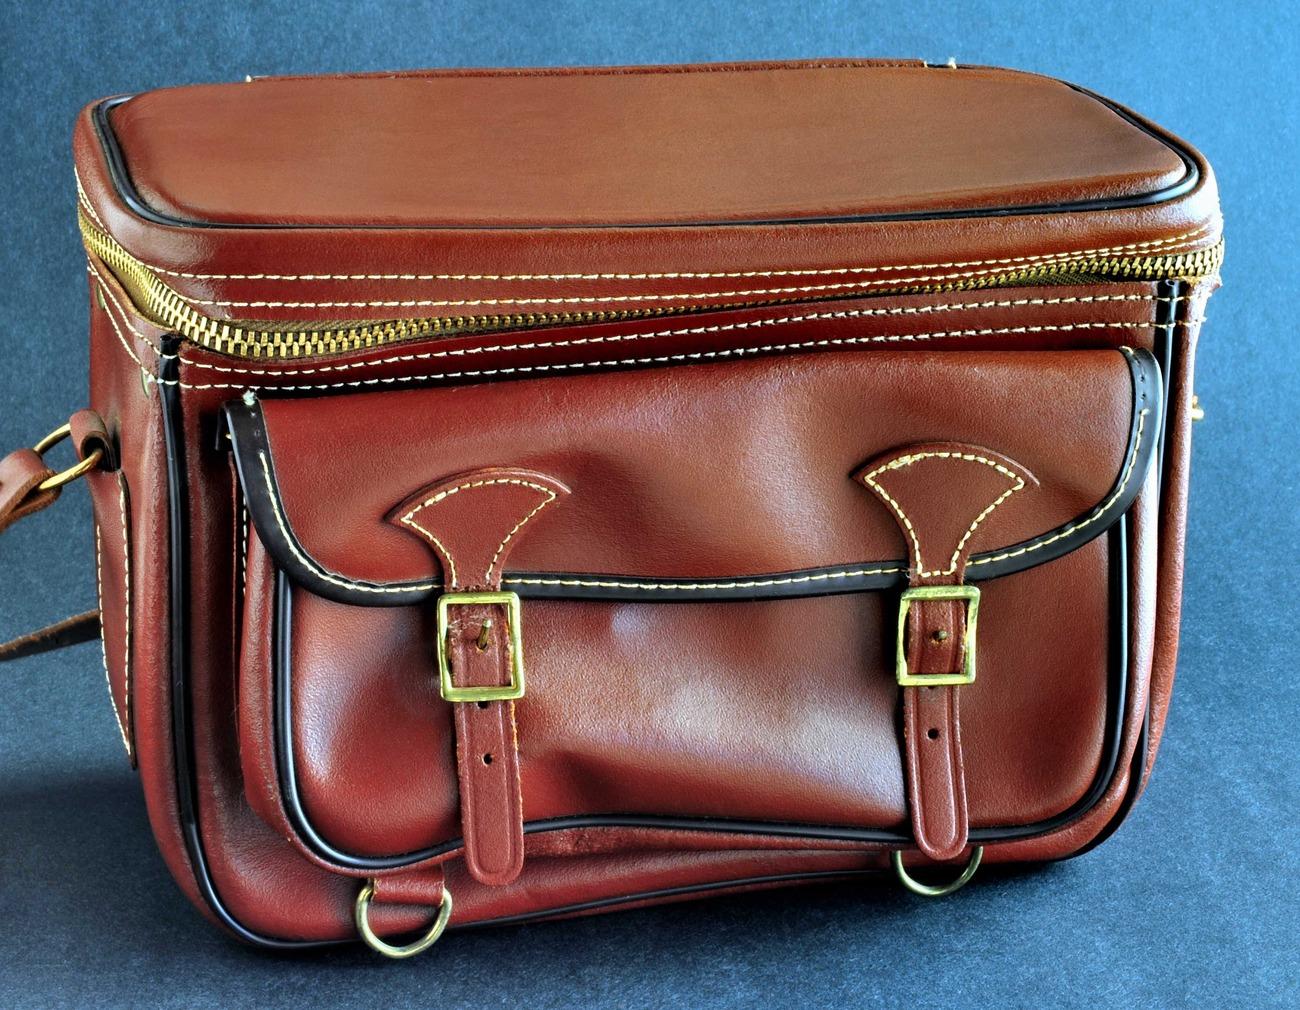 Diamond gadg it bag c813 chestnut brown leather case.small file